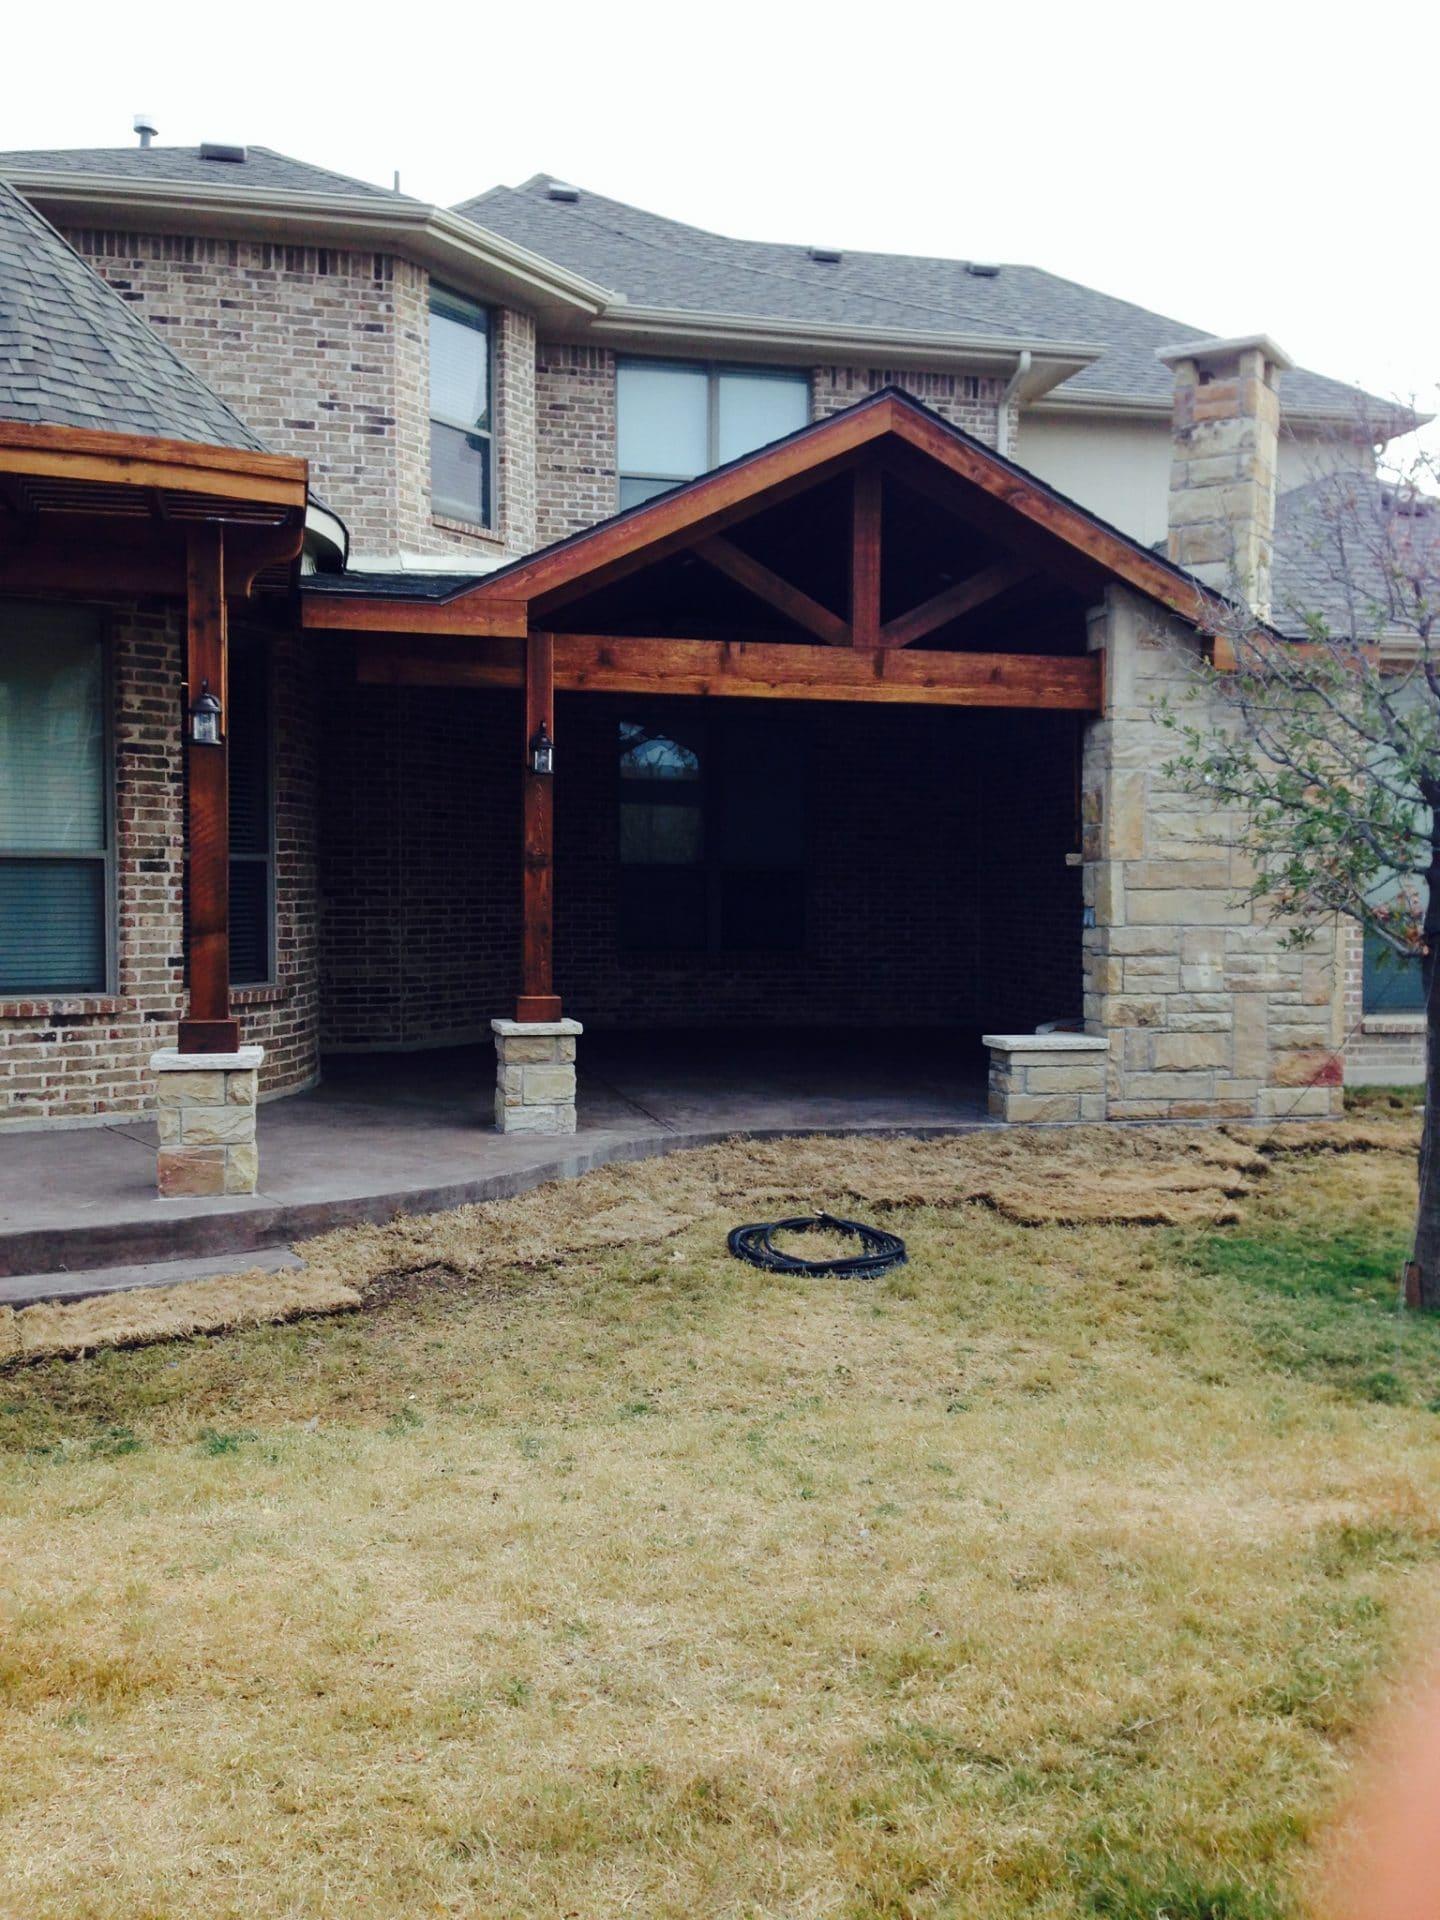 Outdoor Living | Platinum Fence & Patio | Dallas ... on Platinum Outdoor Living id=79193